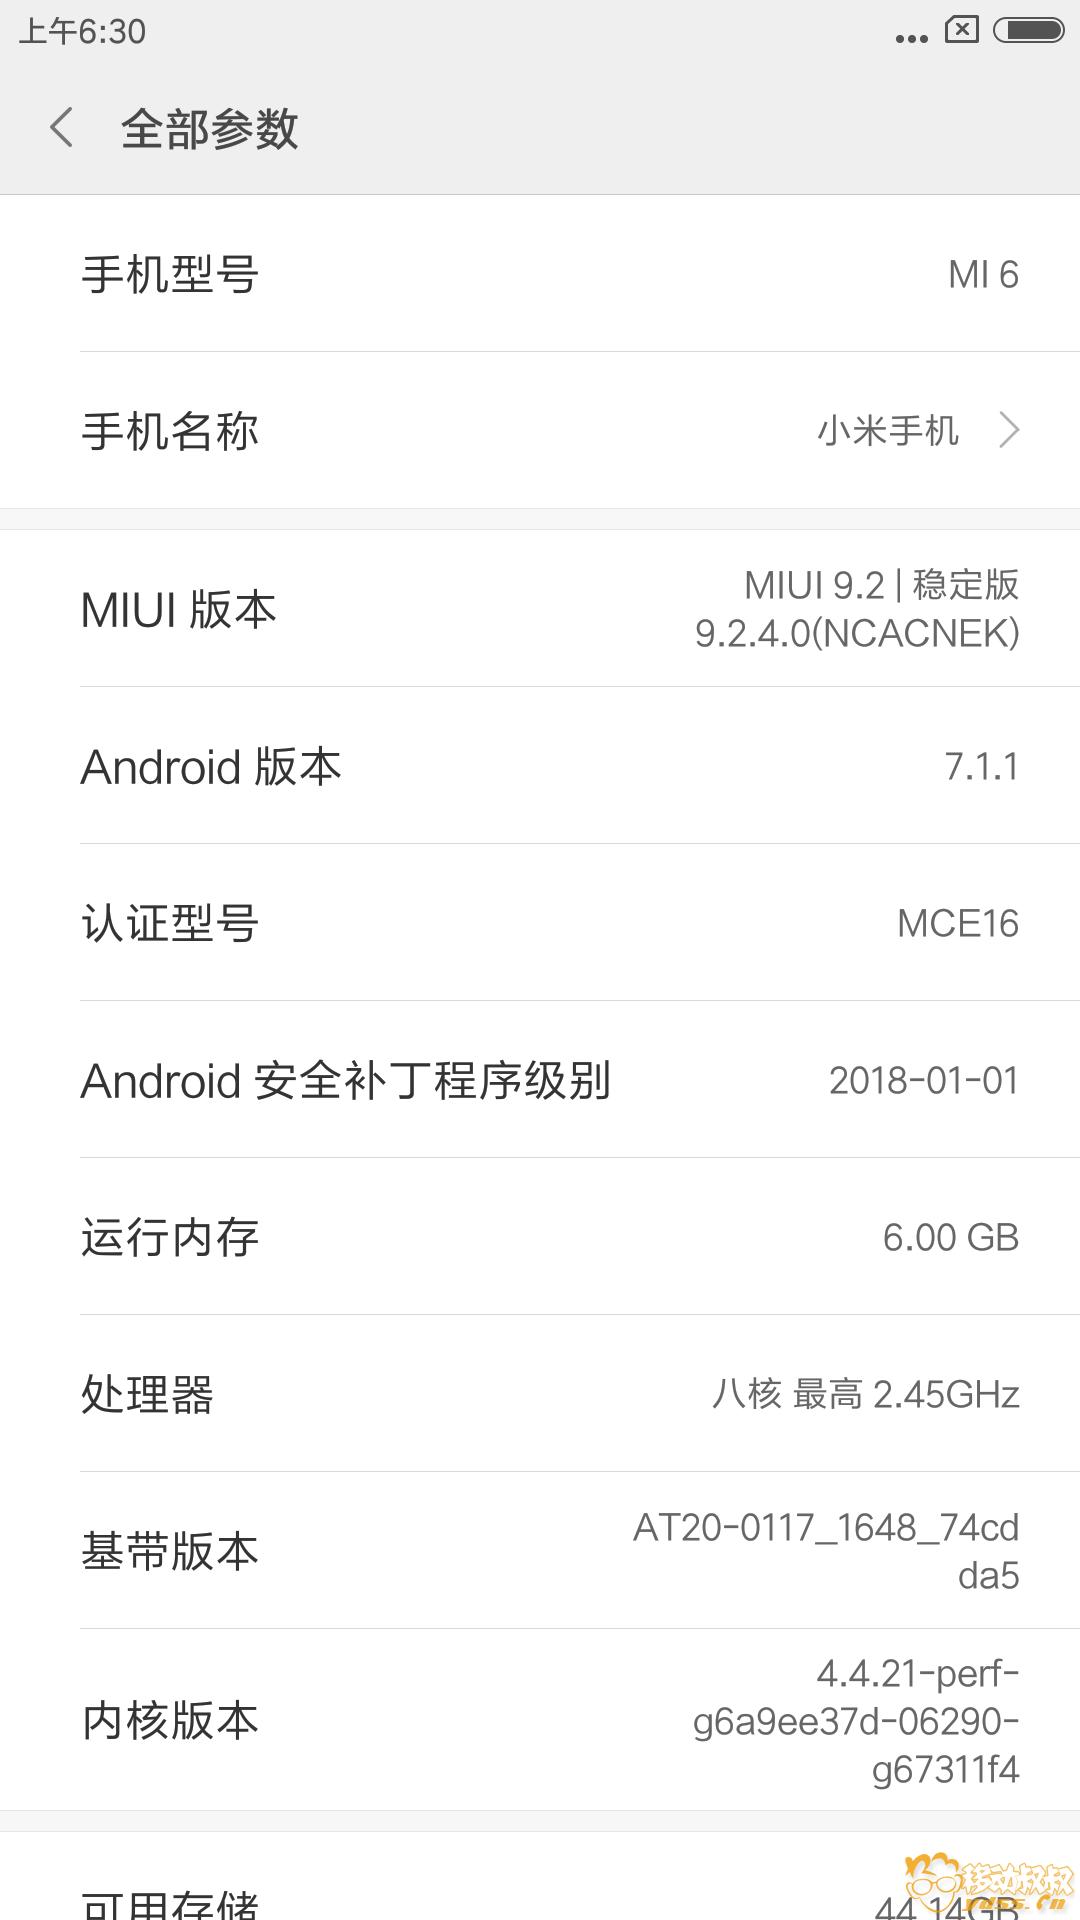 Screenshot_1970-07-28-06-30-09-642_com.android.settings.png